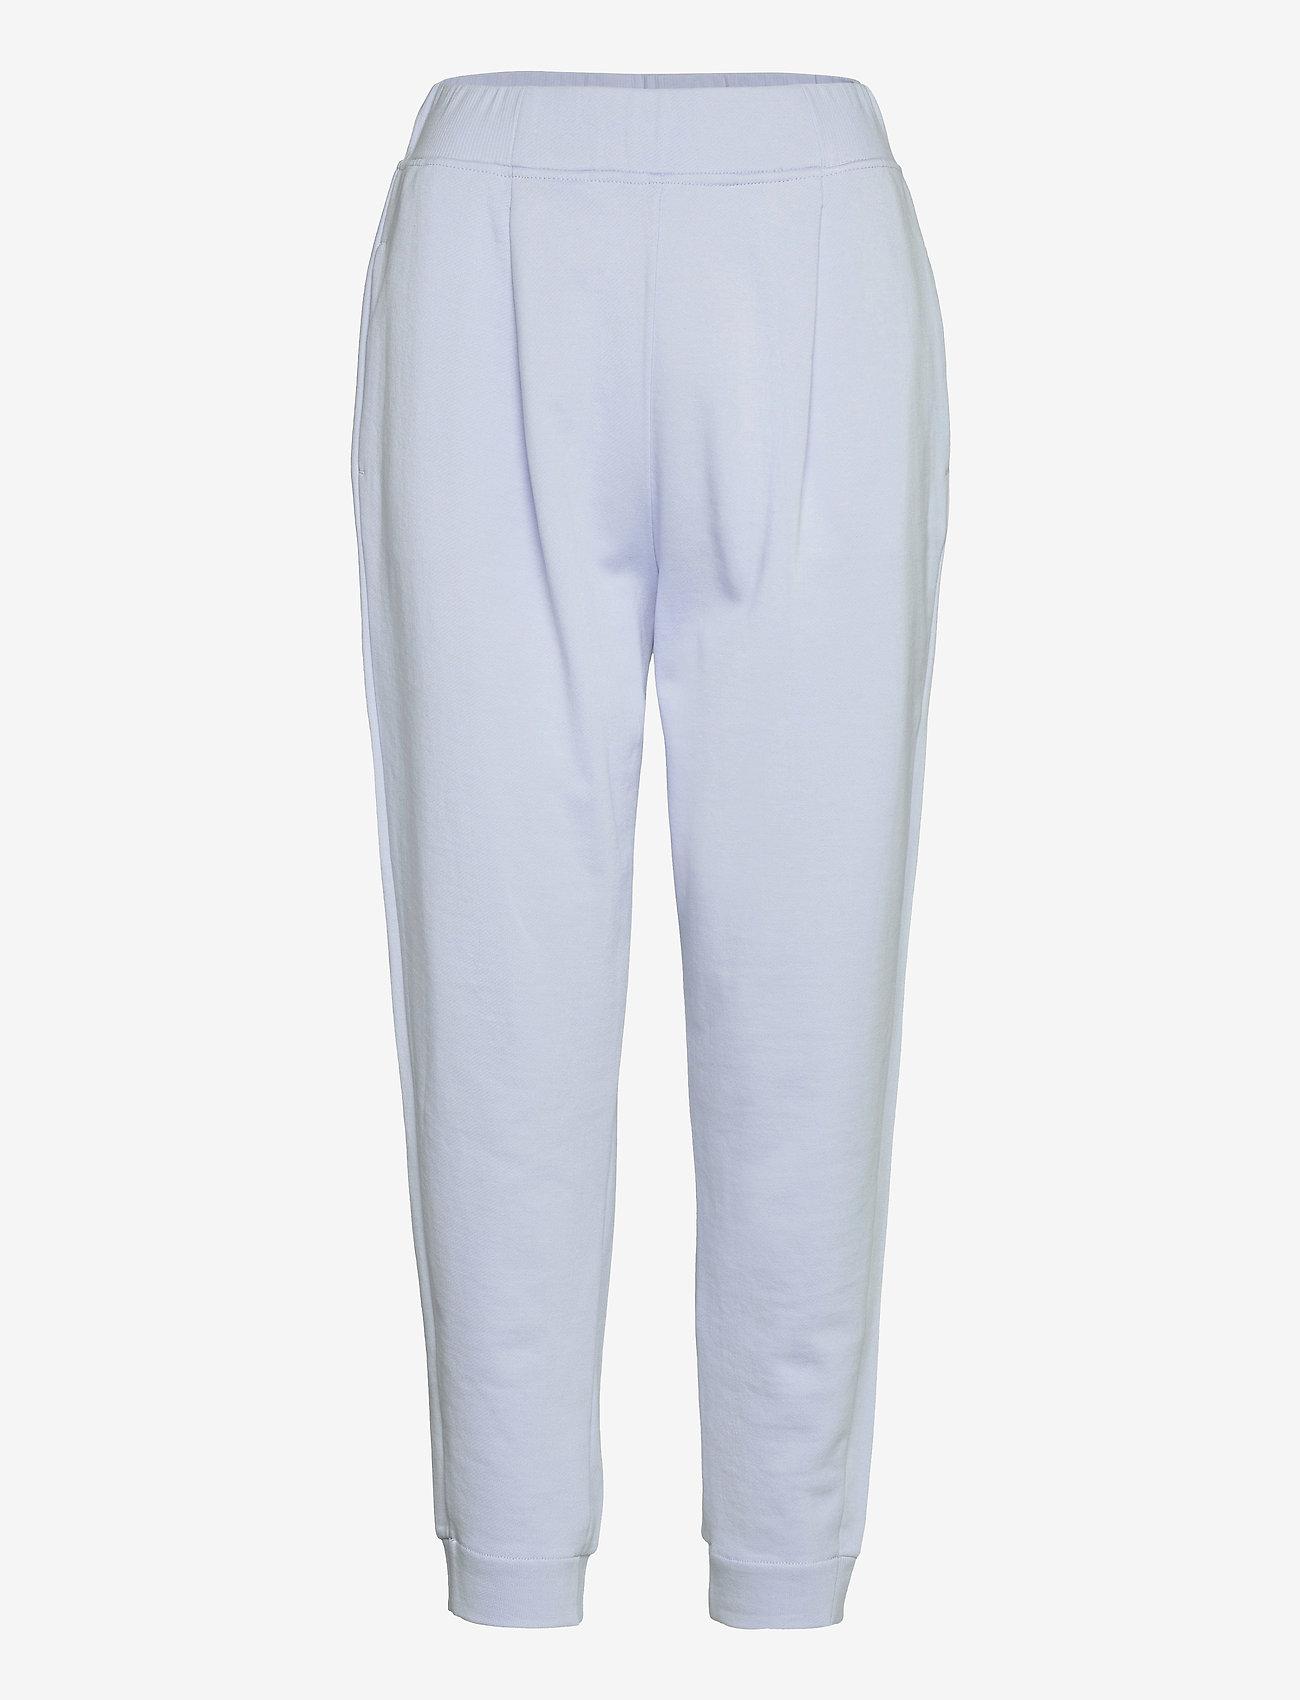 Max Mara Leisure - BRIC - casual trousers - light blue - 0